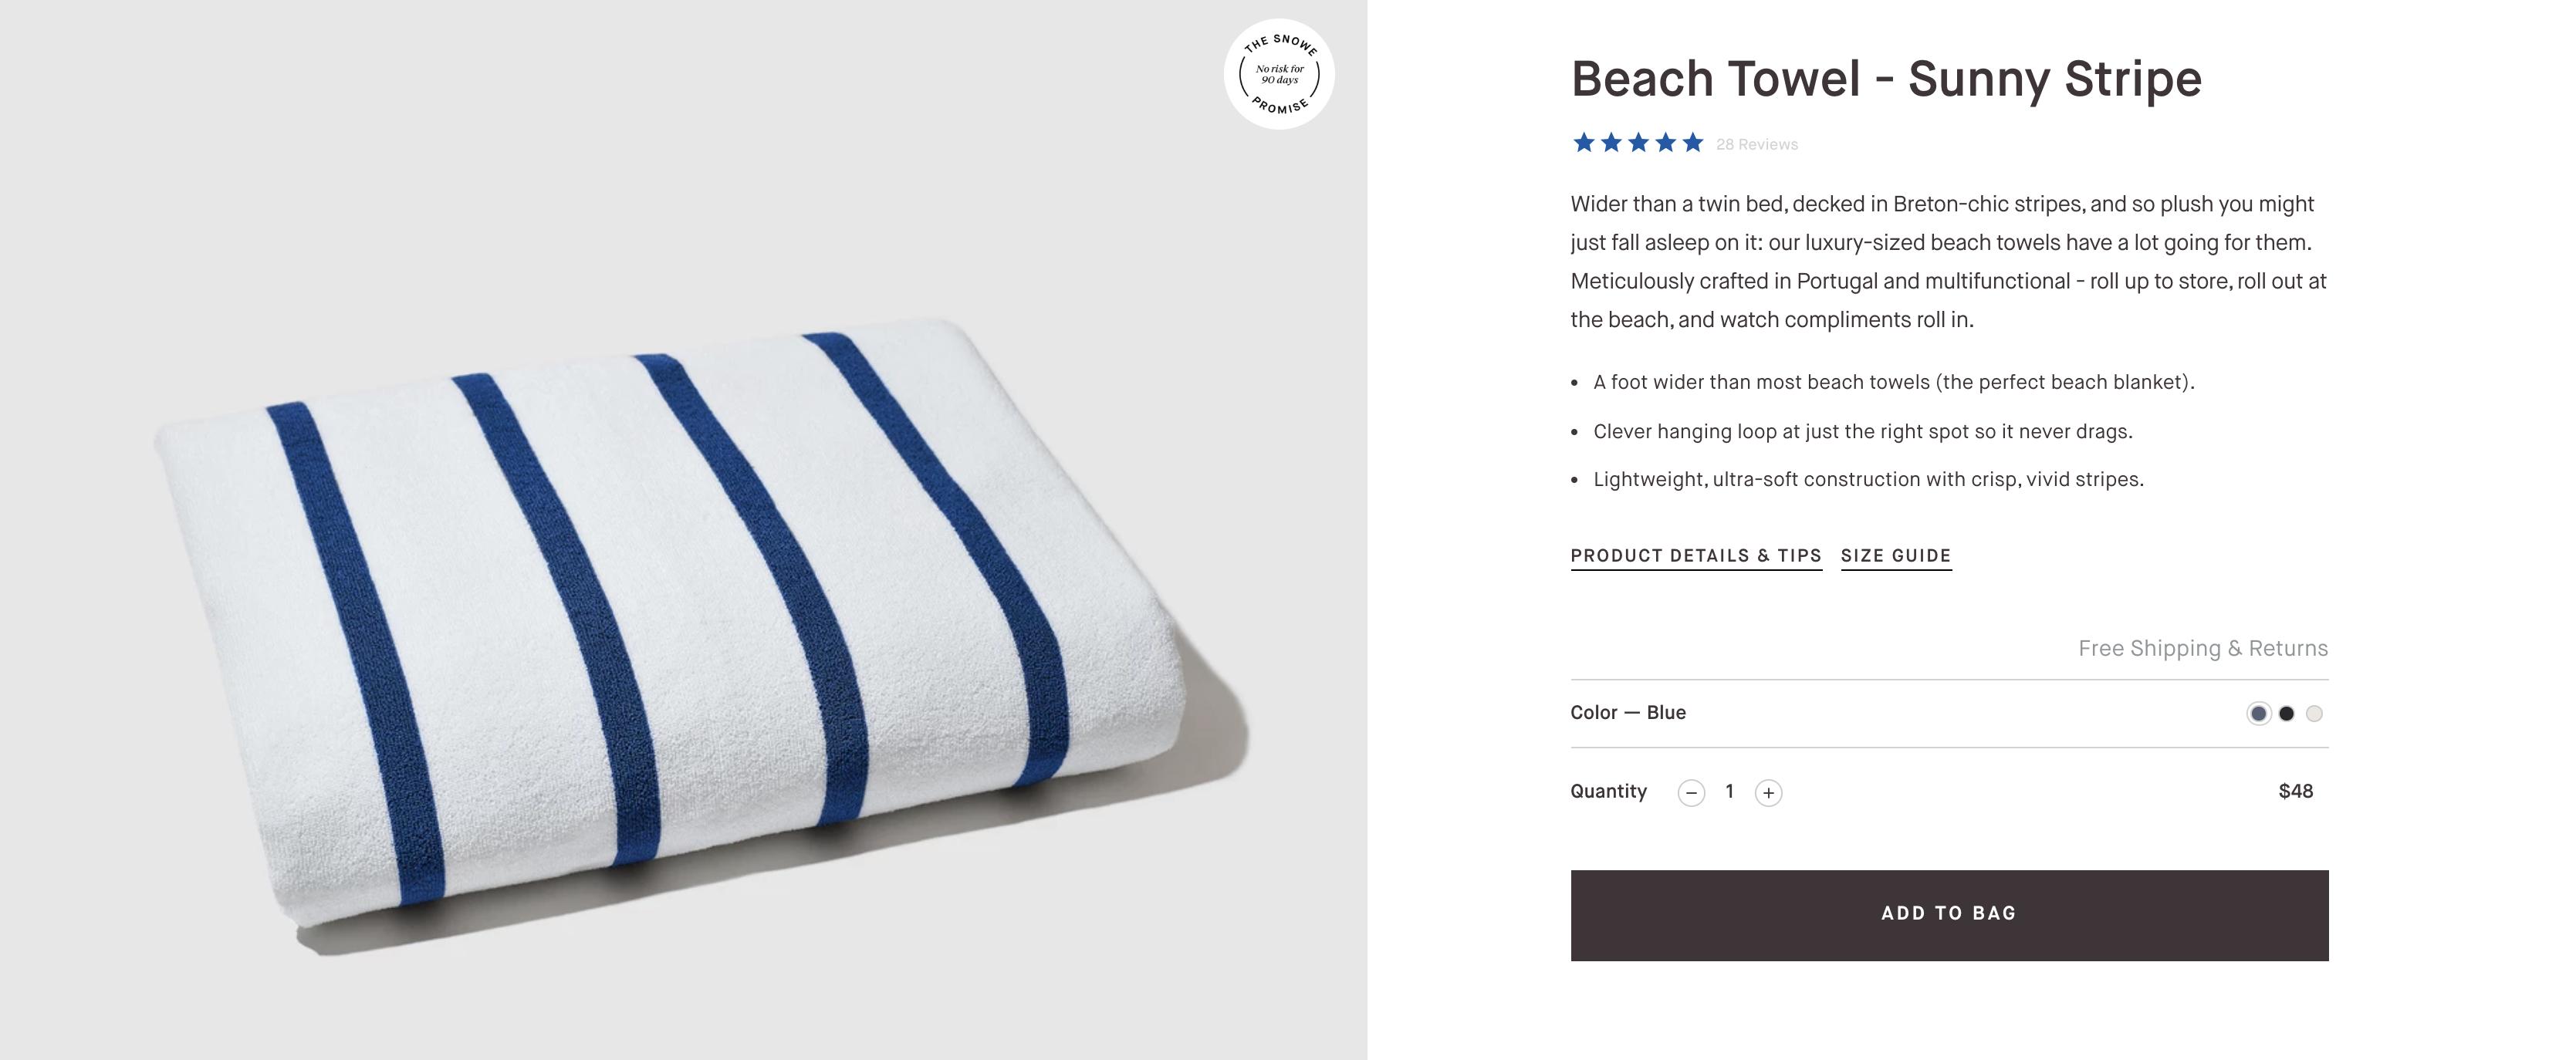 snowe home website screenshot of product description